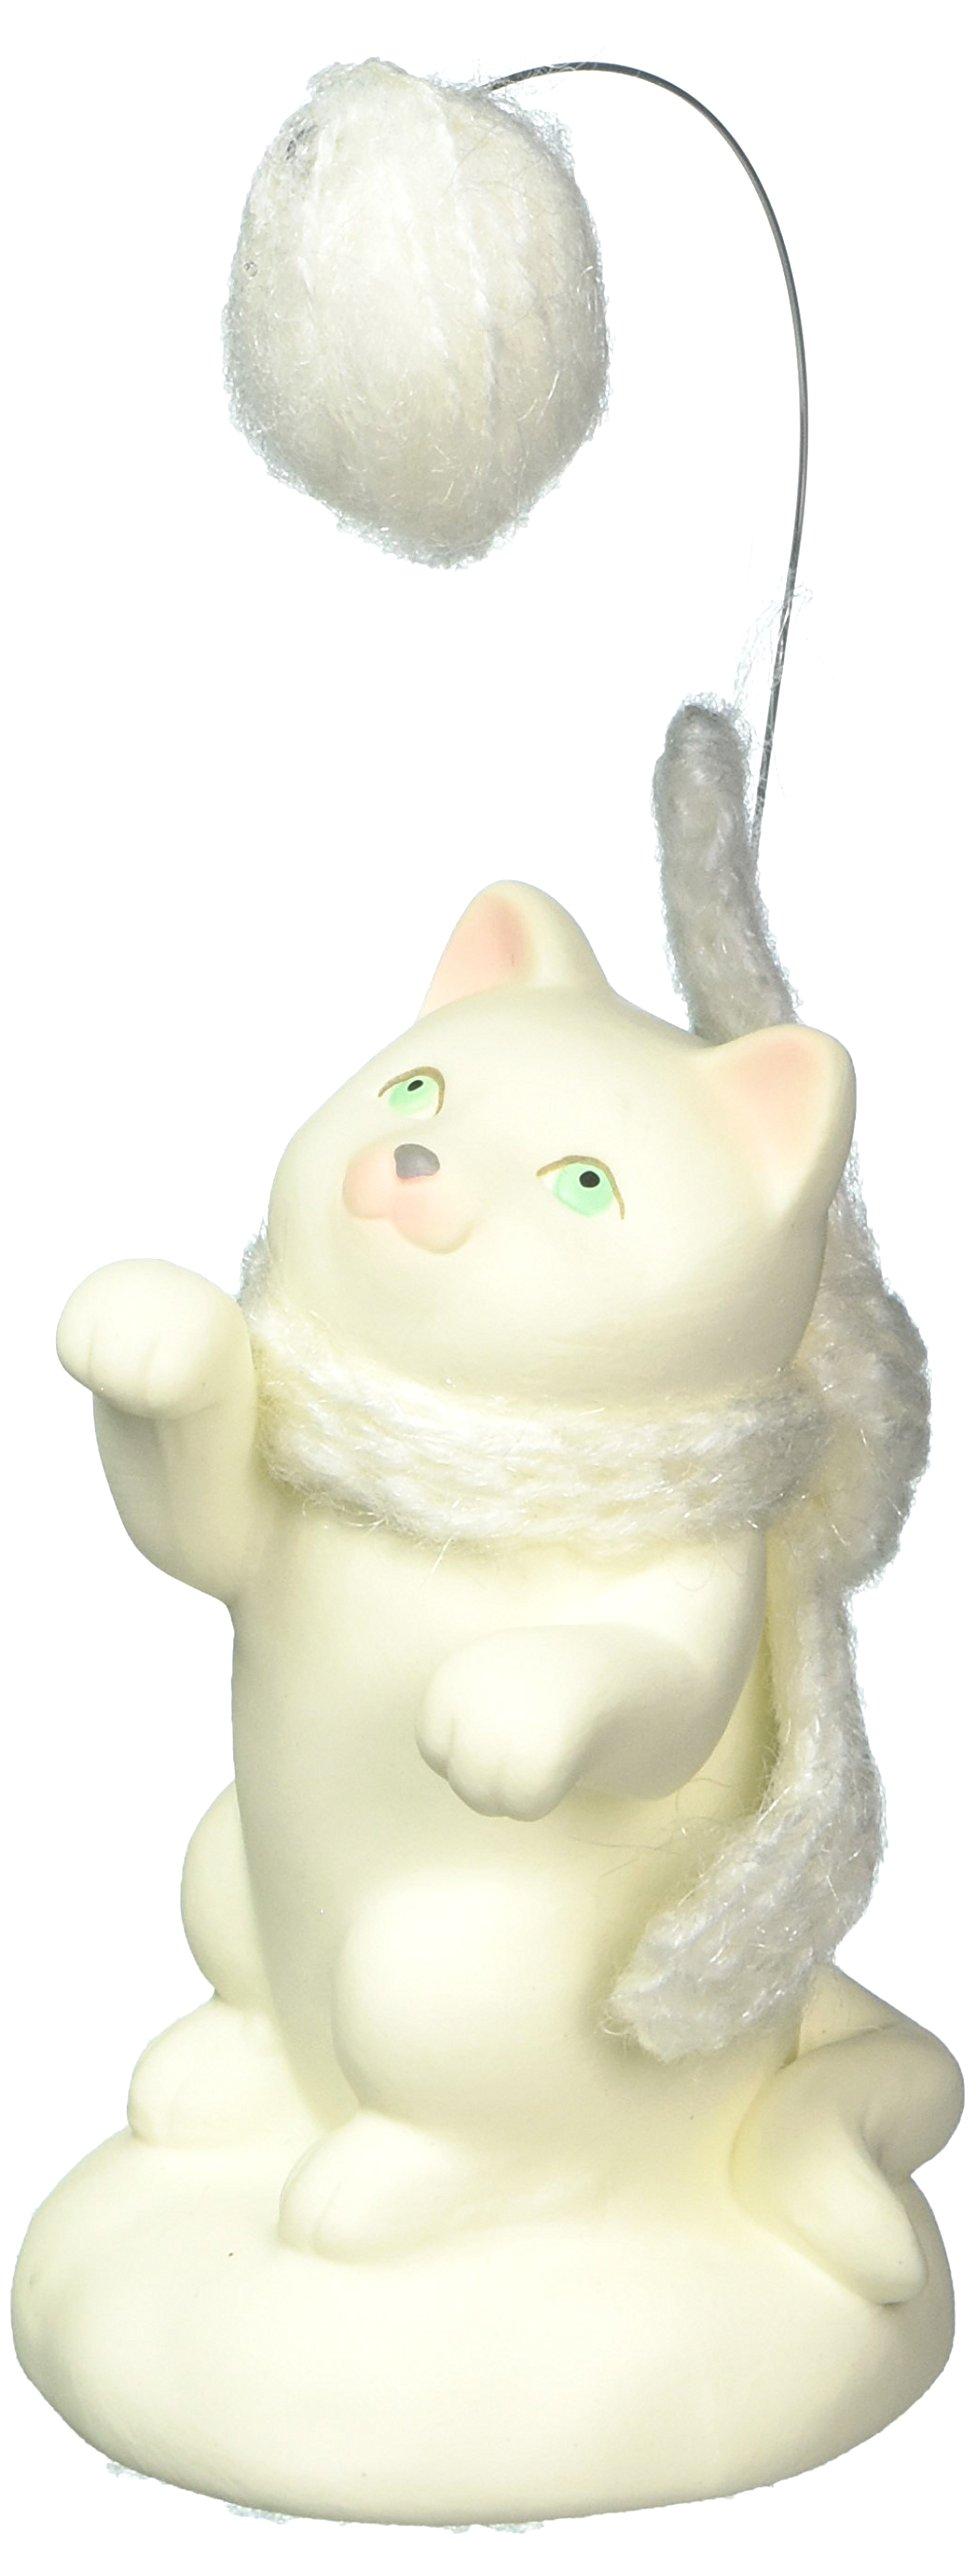 Department 56 Snowbabies Collectible Cat Animal Figurine, 4.25''